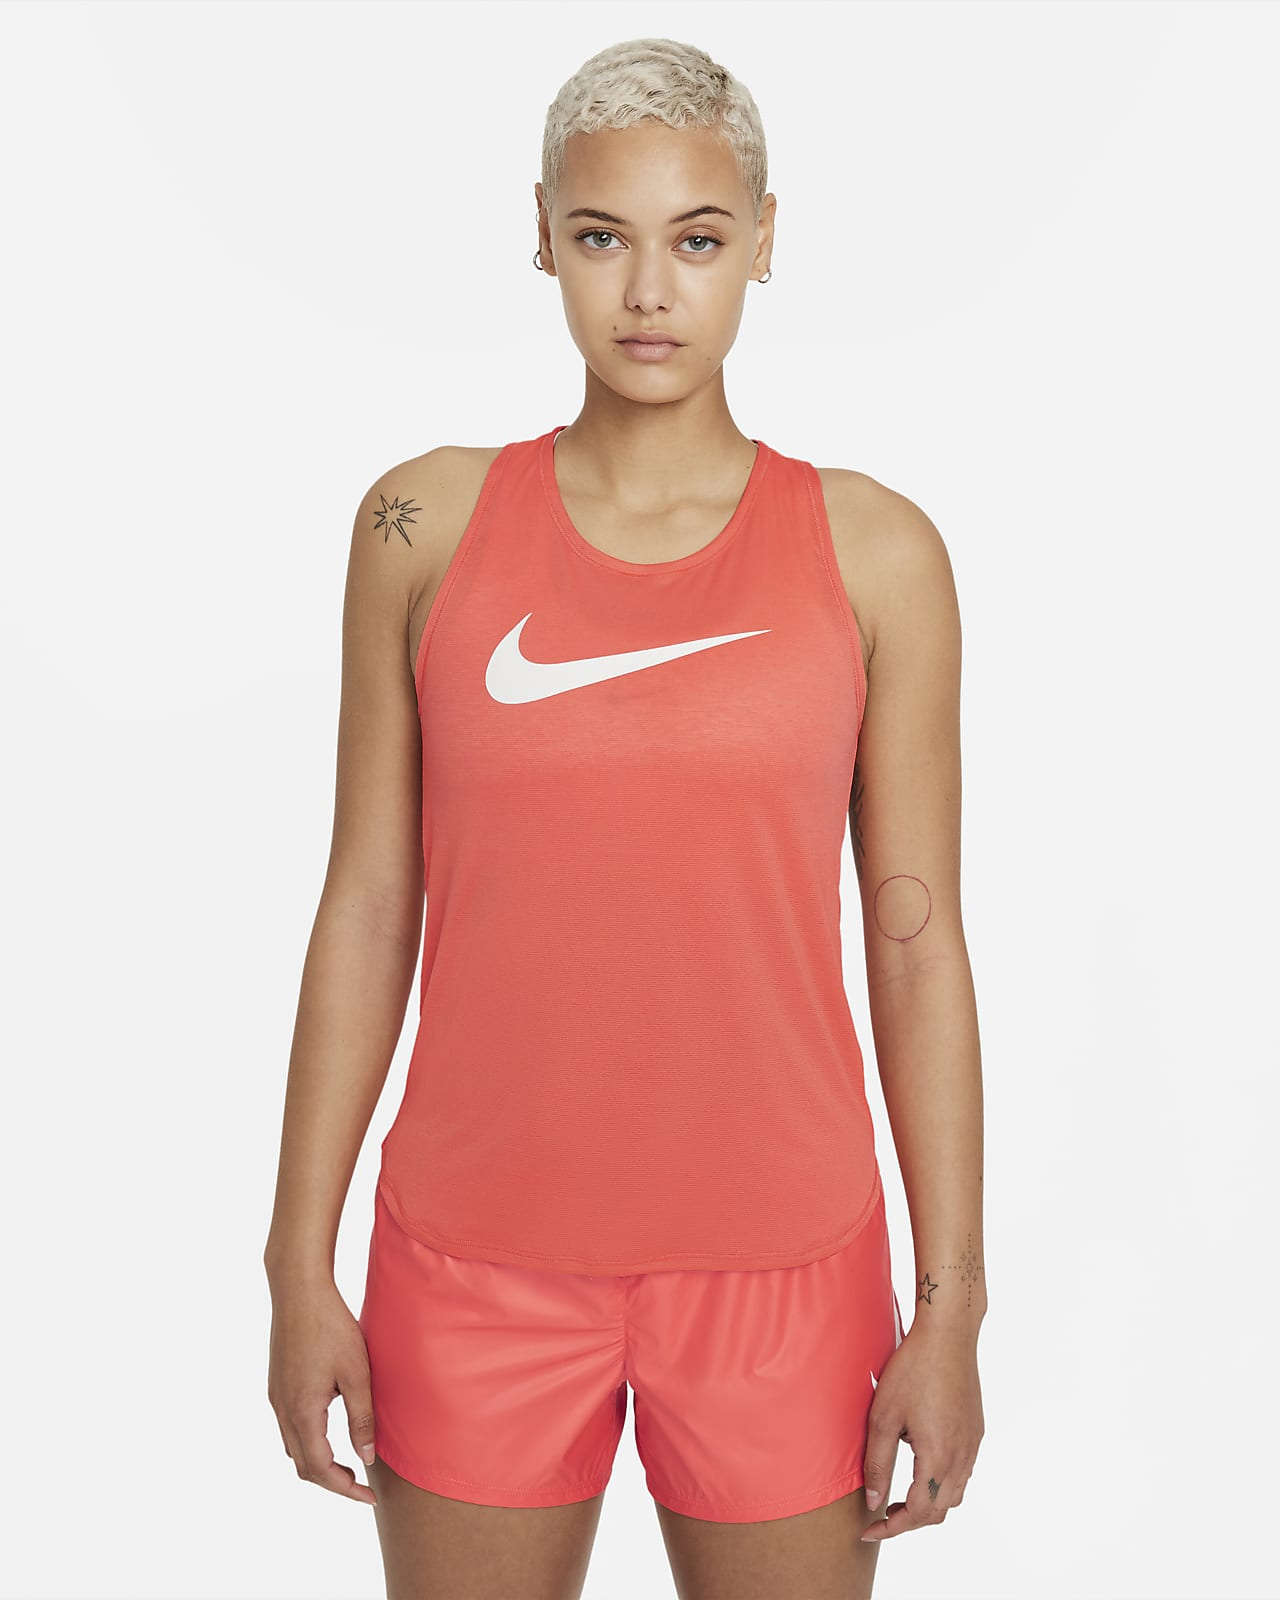 Camiseta de tirantes de running para mujer Nike Swoosh Run